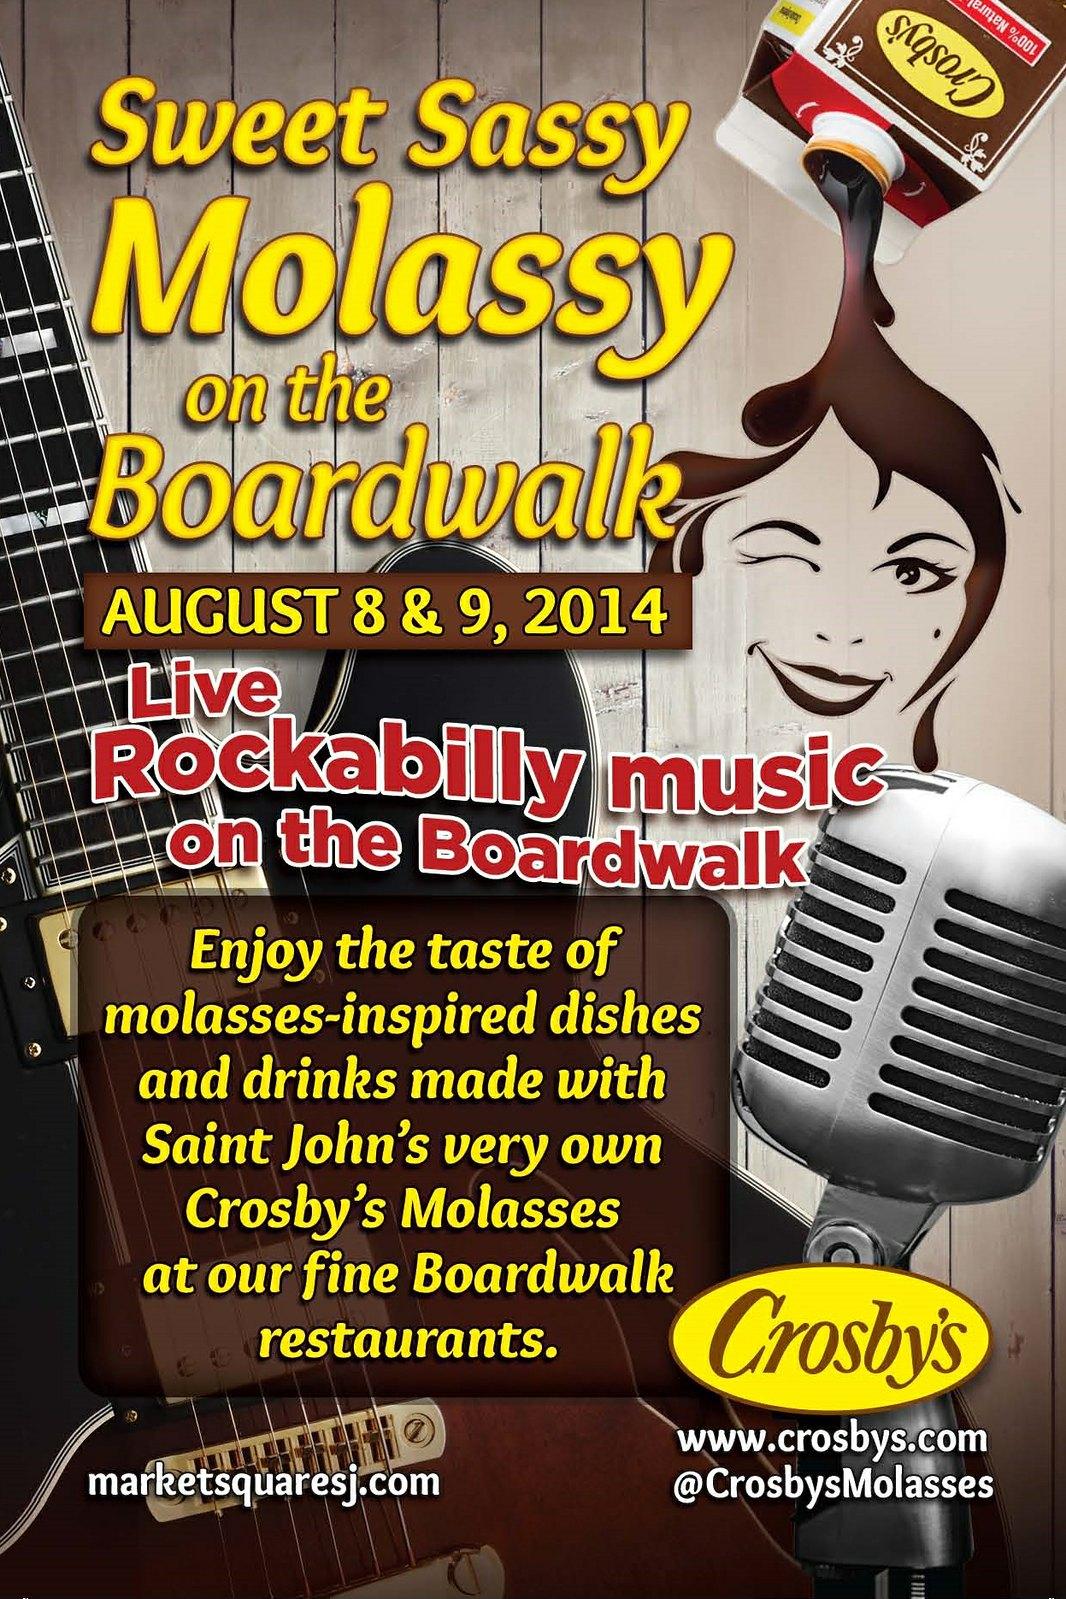 Crosbys Sweet Sassy Molassy 4x6 PRINT